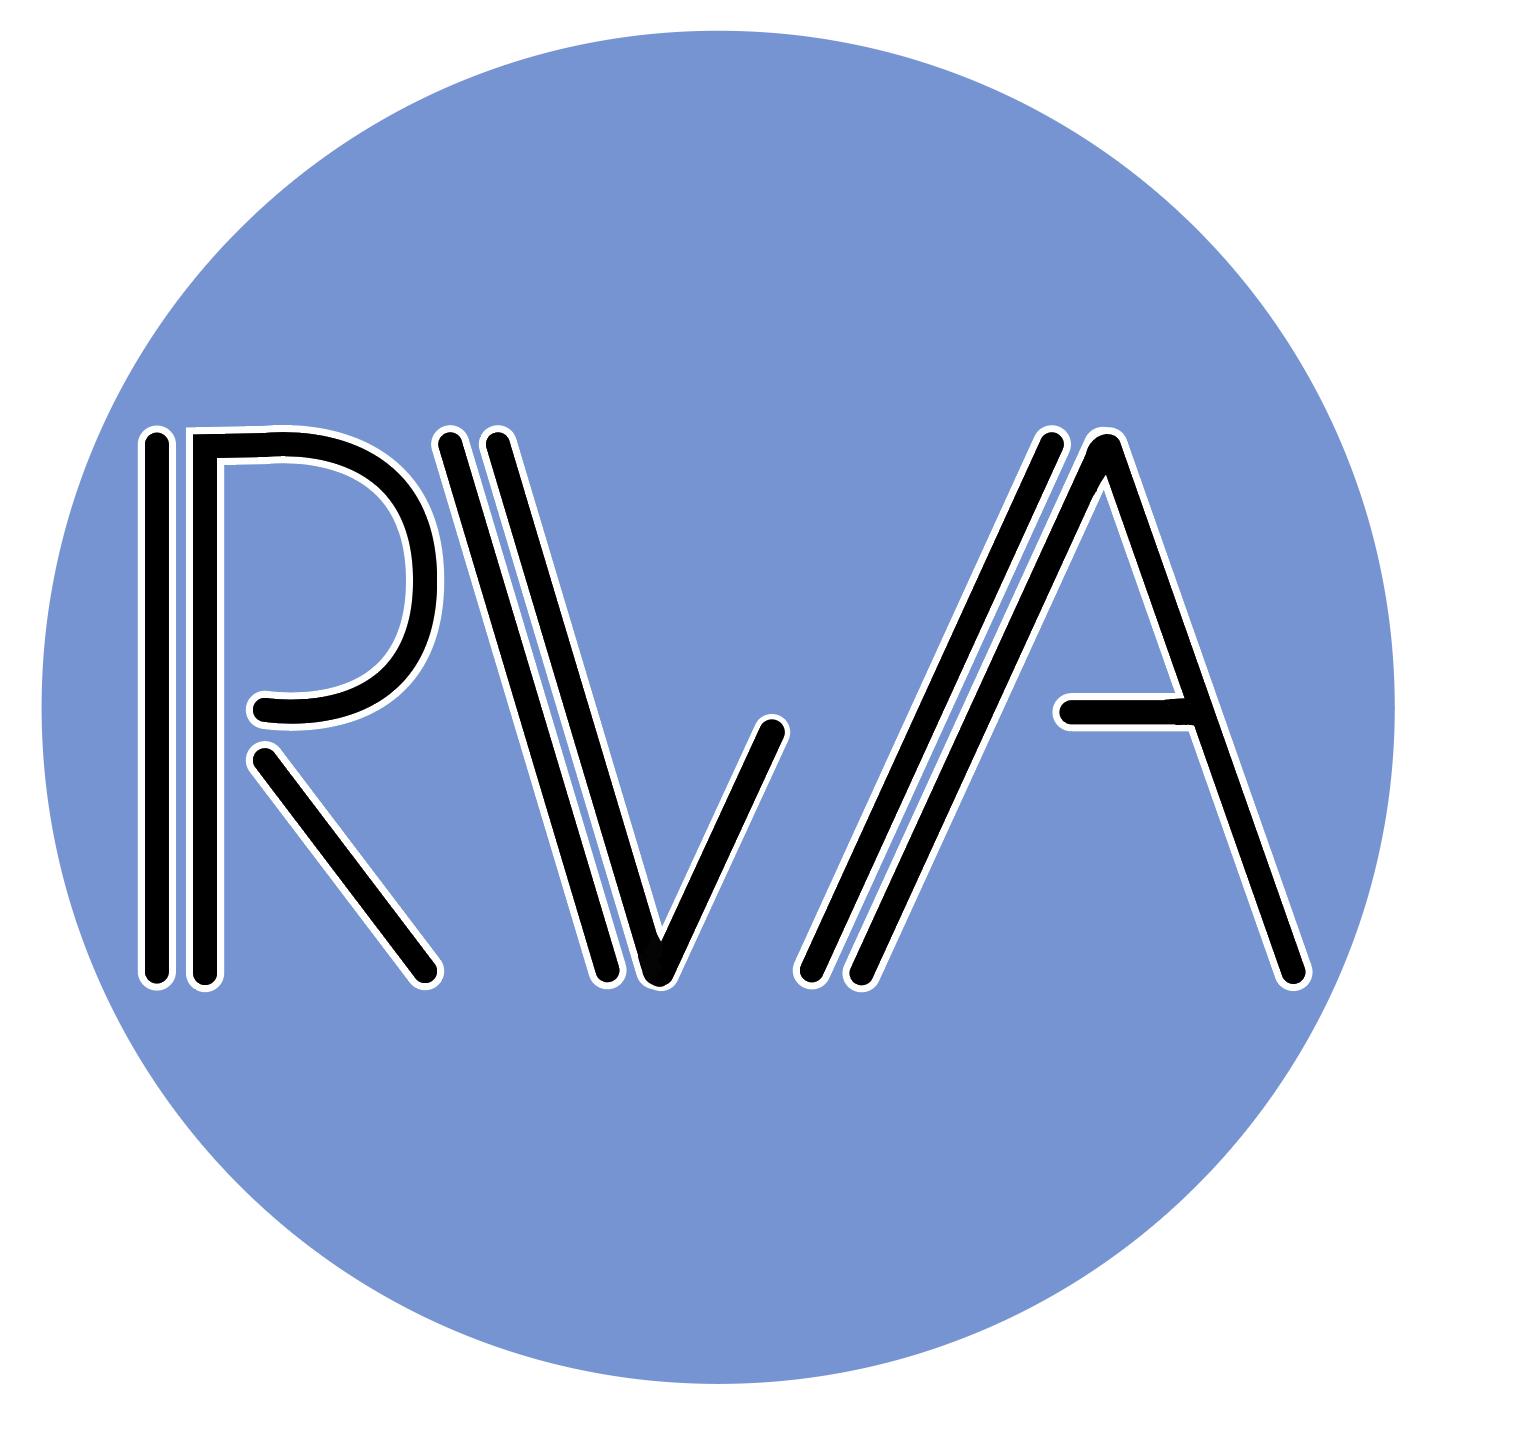 RWA Blue-Black.png